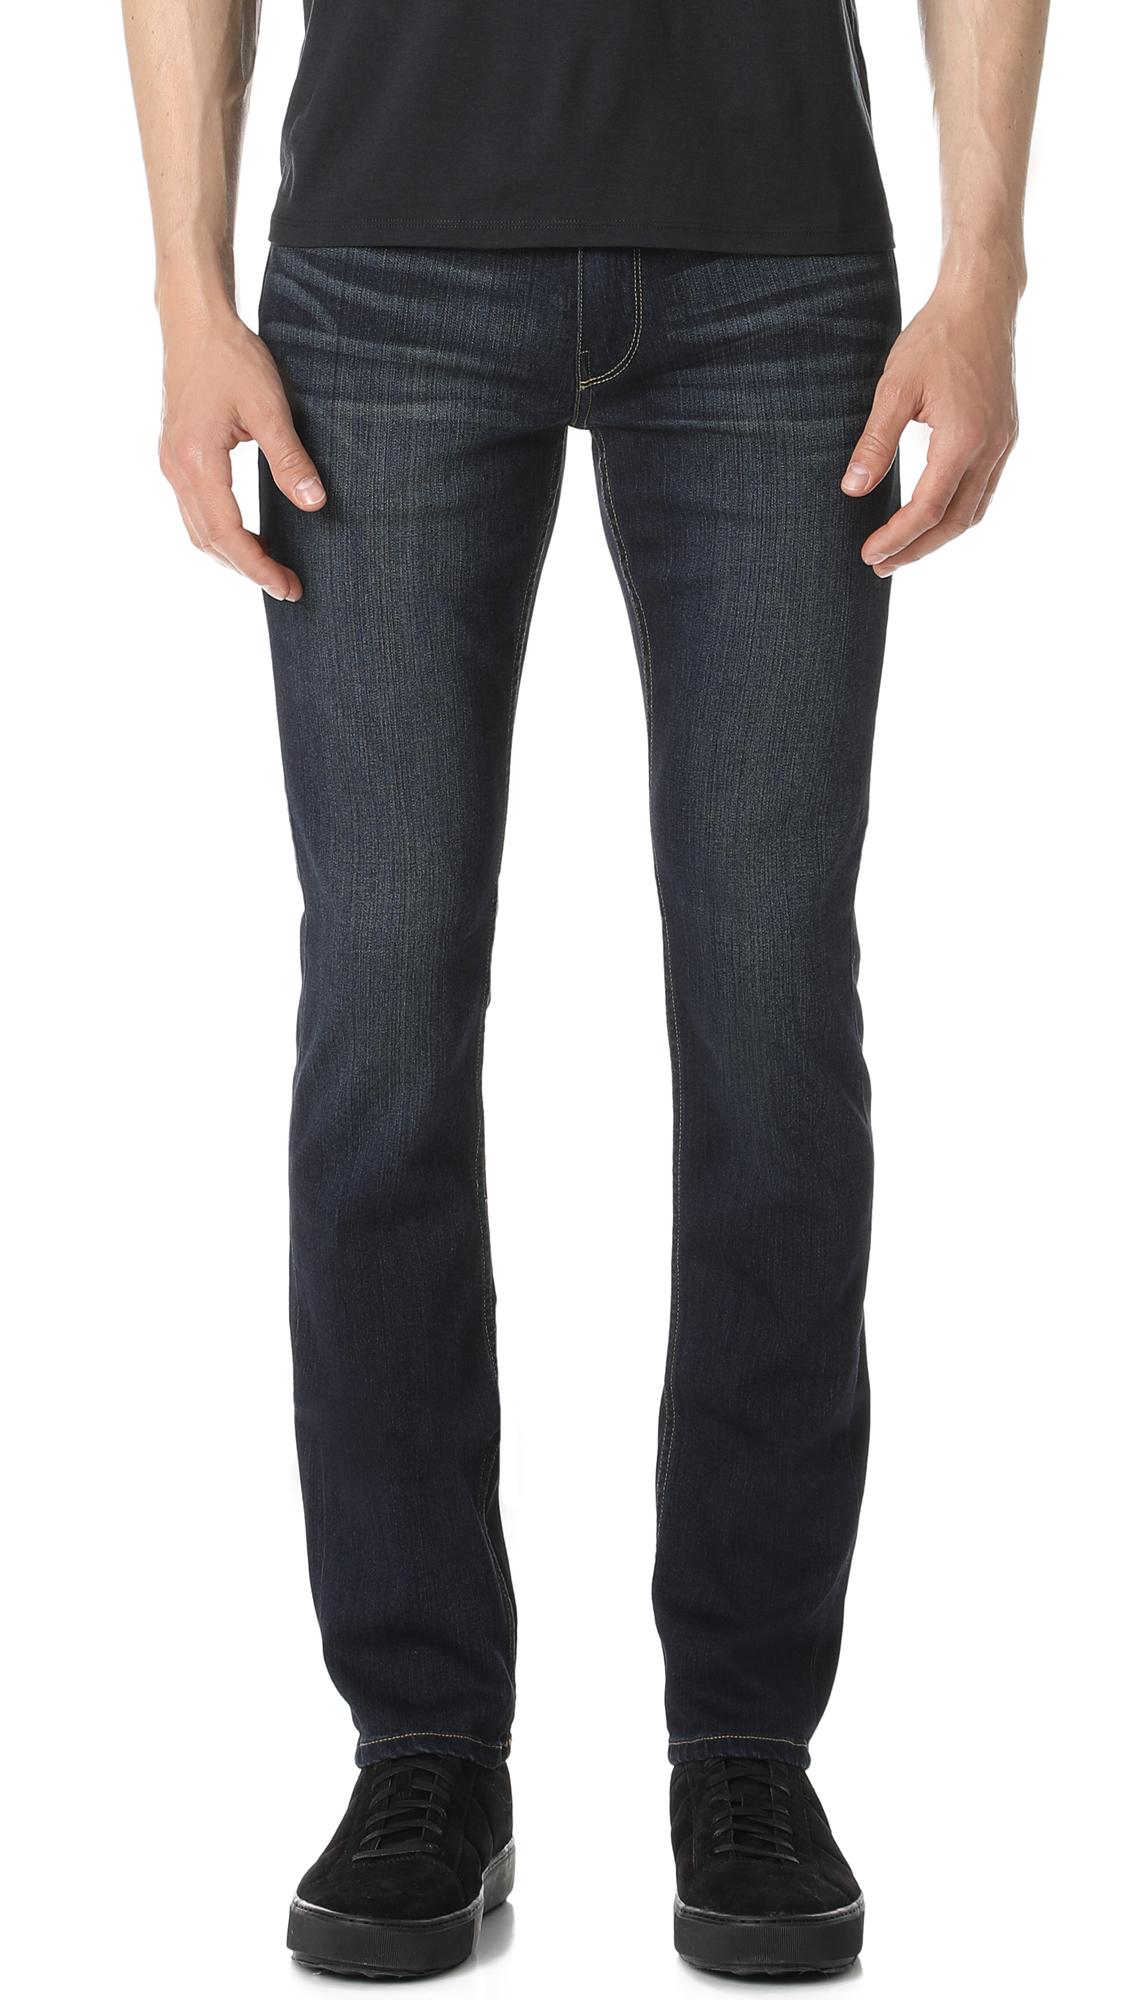 Lennox Rigby Jeans